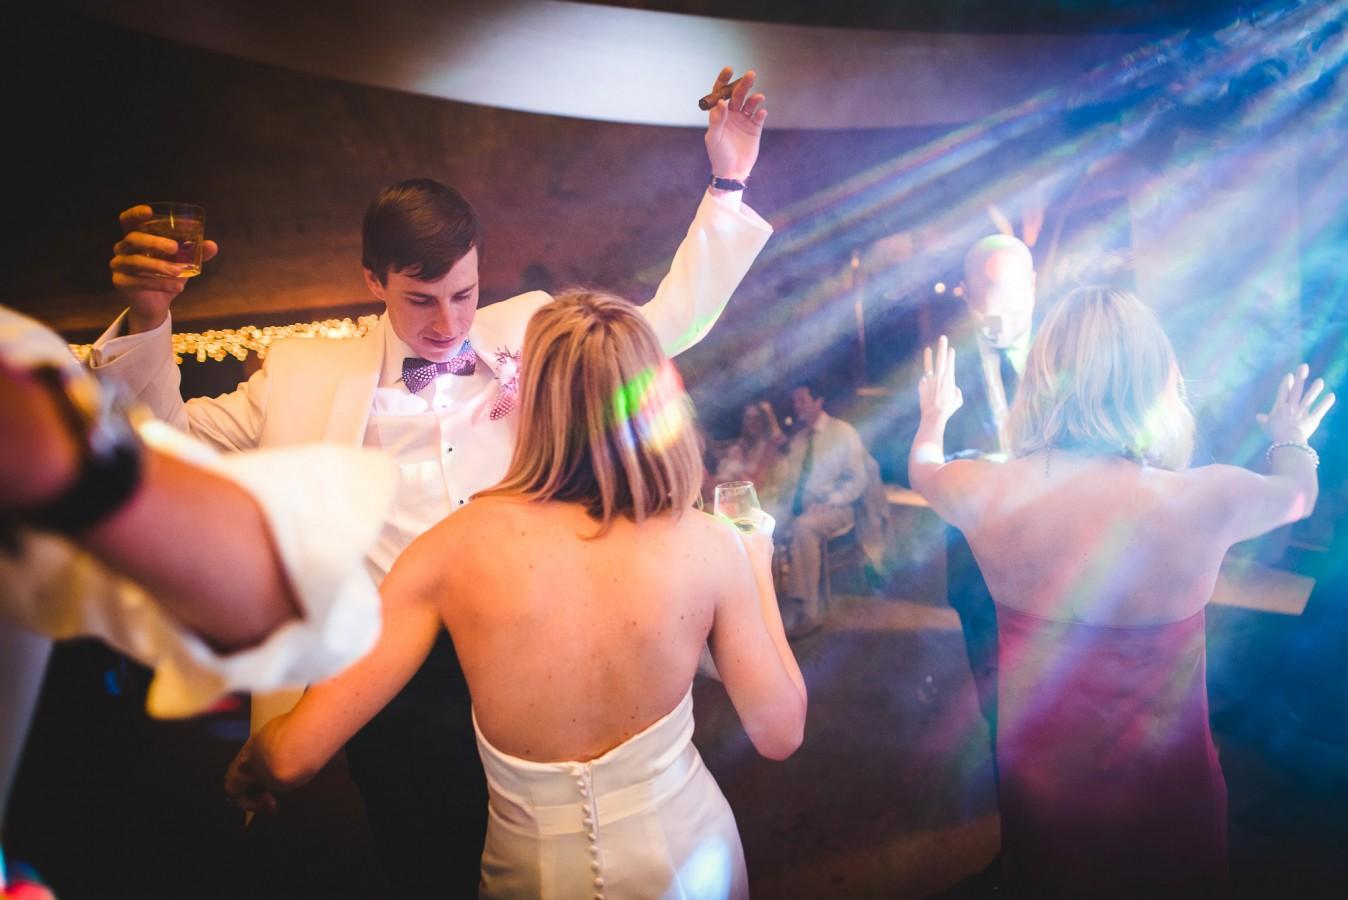 fete-photography-weddings-003